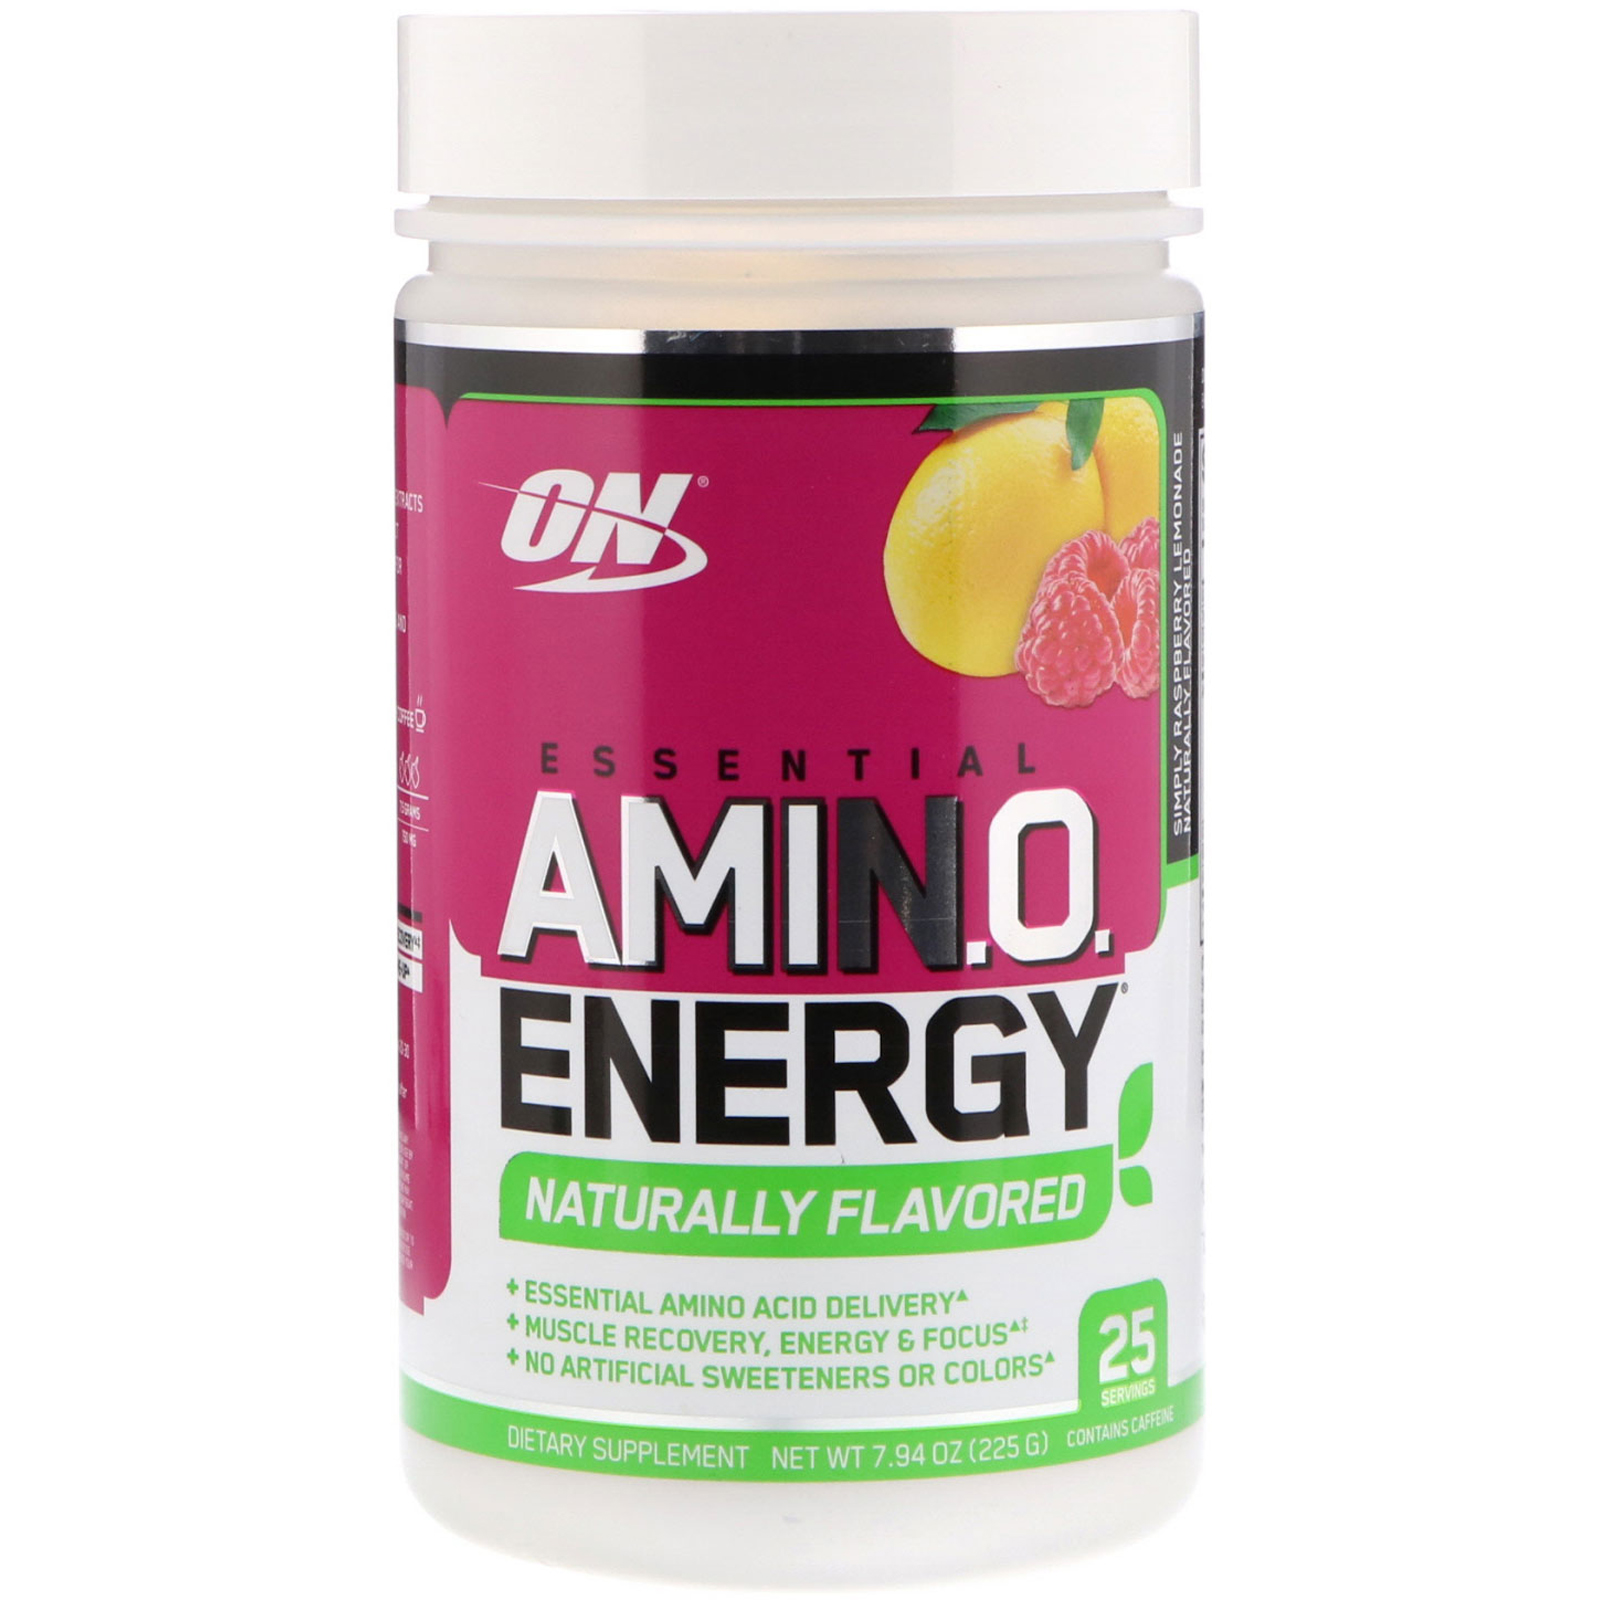 Electrolytes Watermelon Splash 30 Servin Endurance & Energy Bars, Drinks & Pills Dependable Amino Energy Health & Beauty